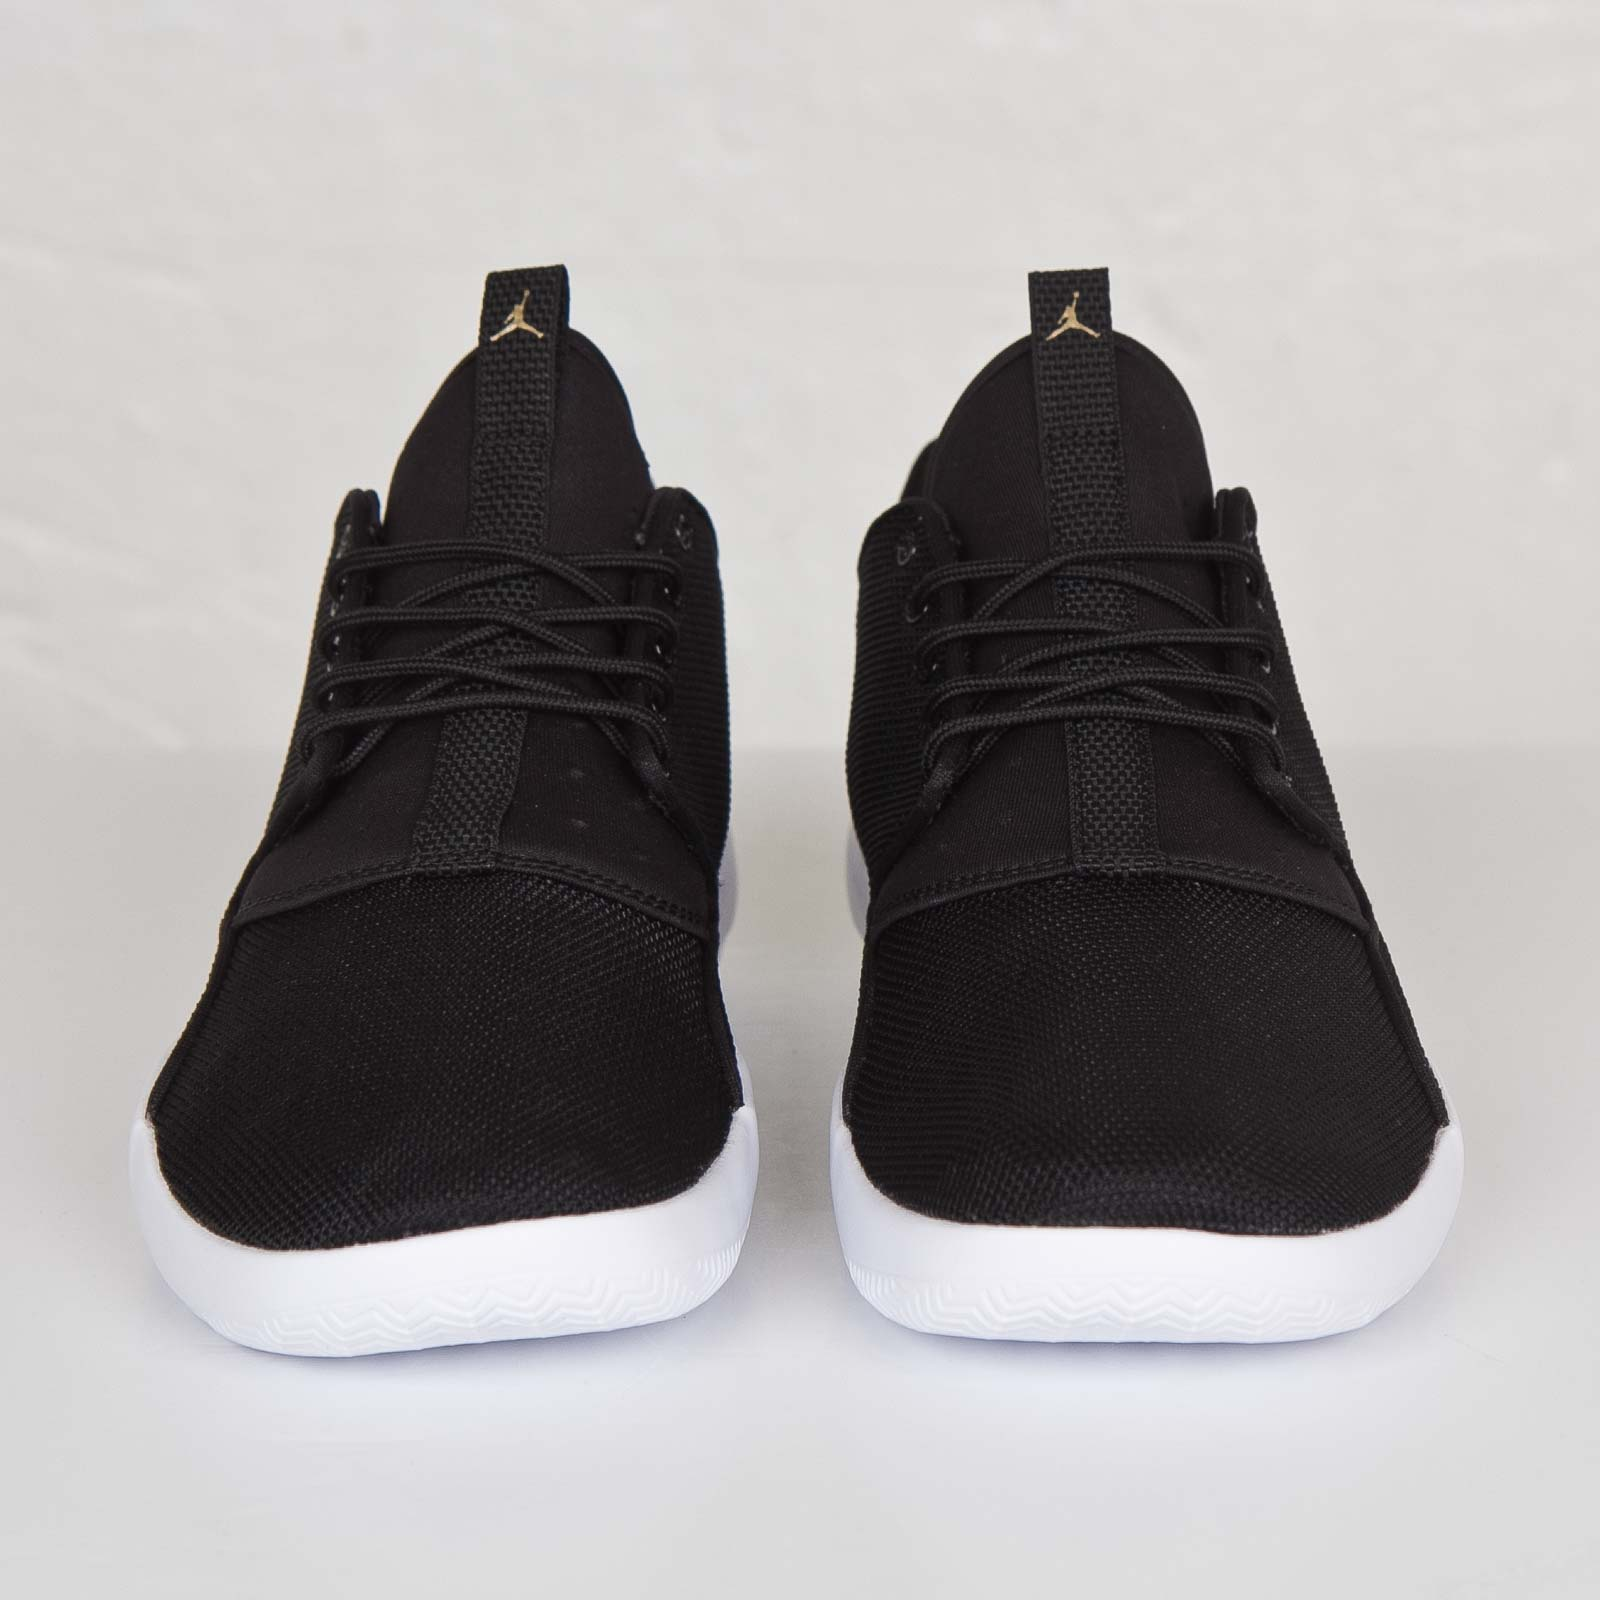 e3d8a14c2369 Jordan Brand Jordan Eclipse - 724010-014 - Sneakersnstuff